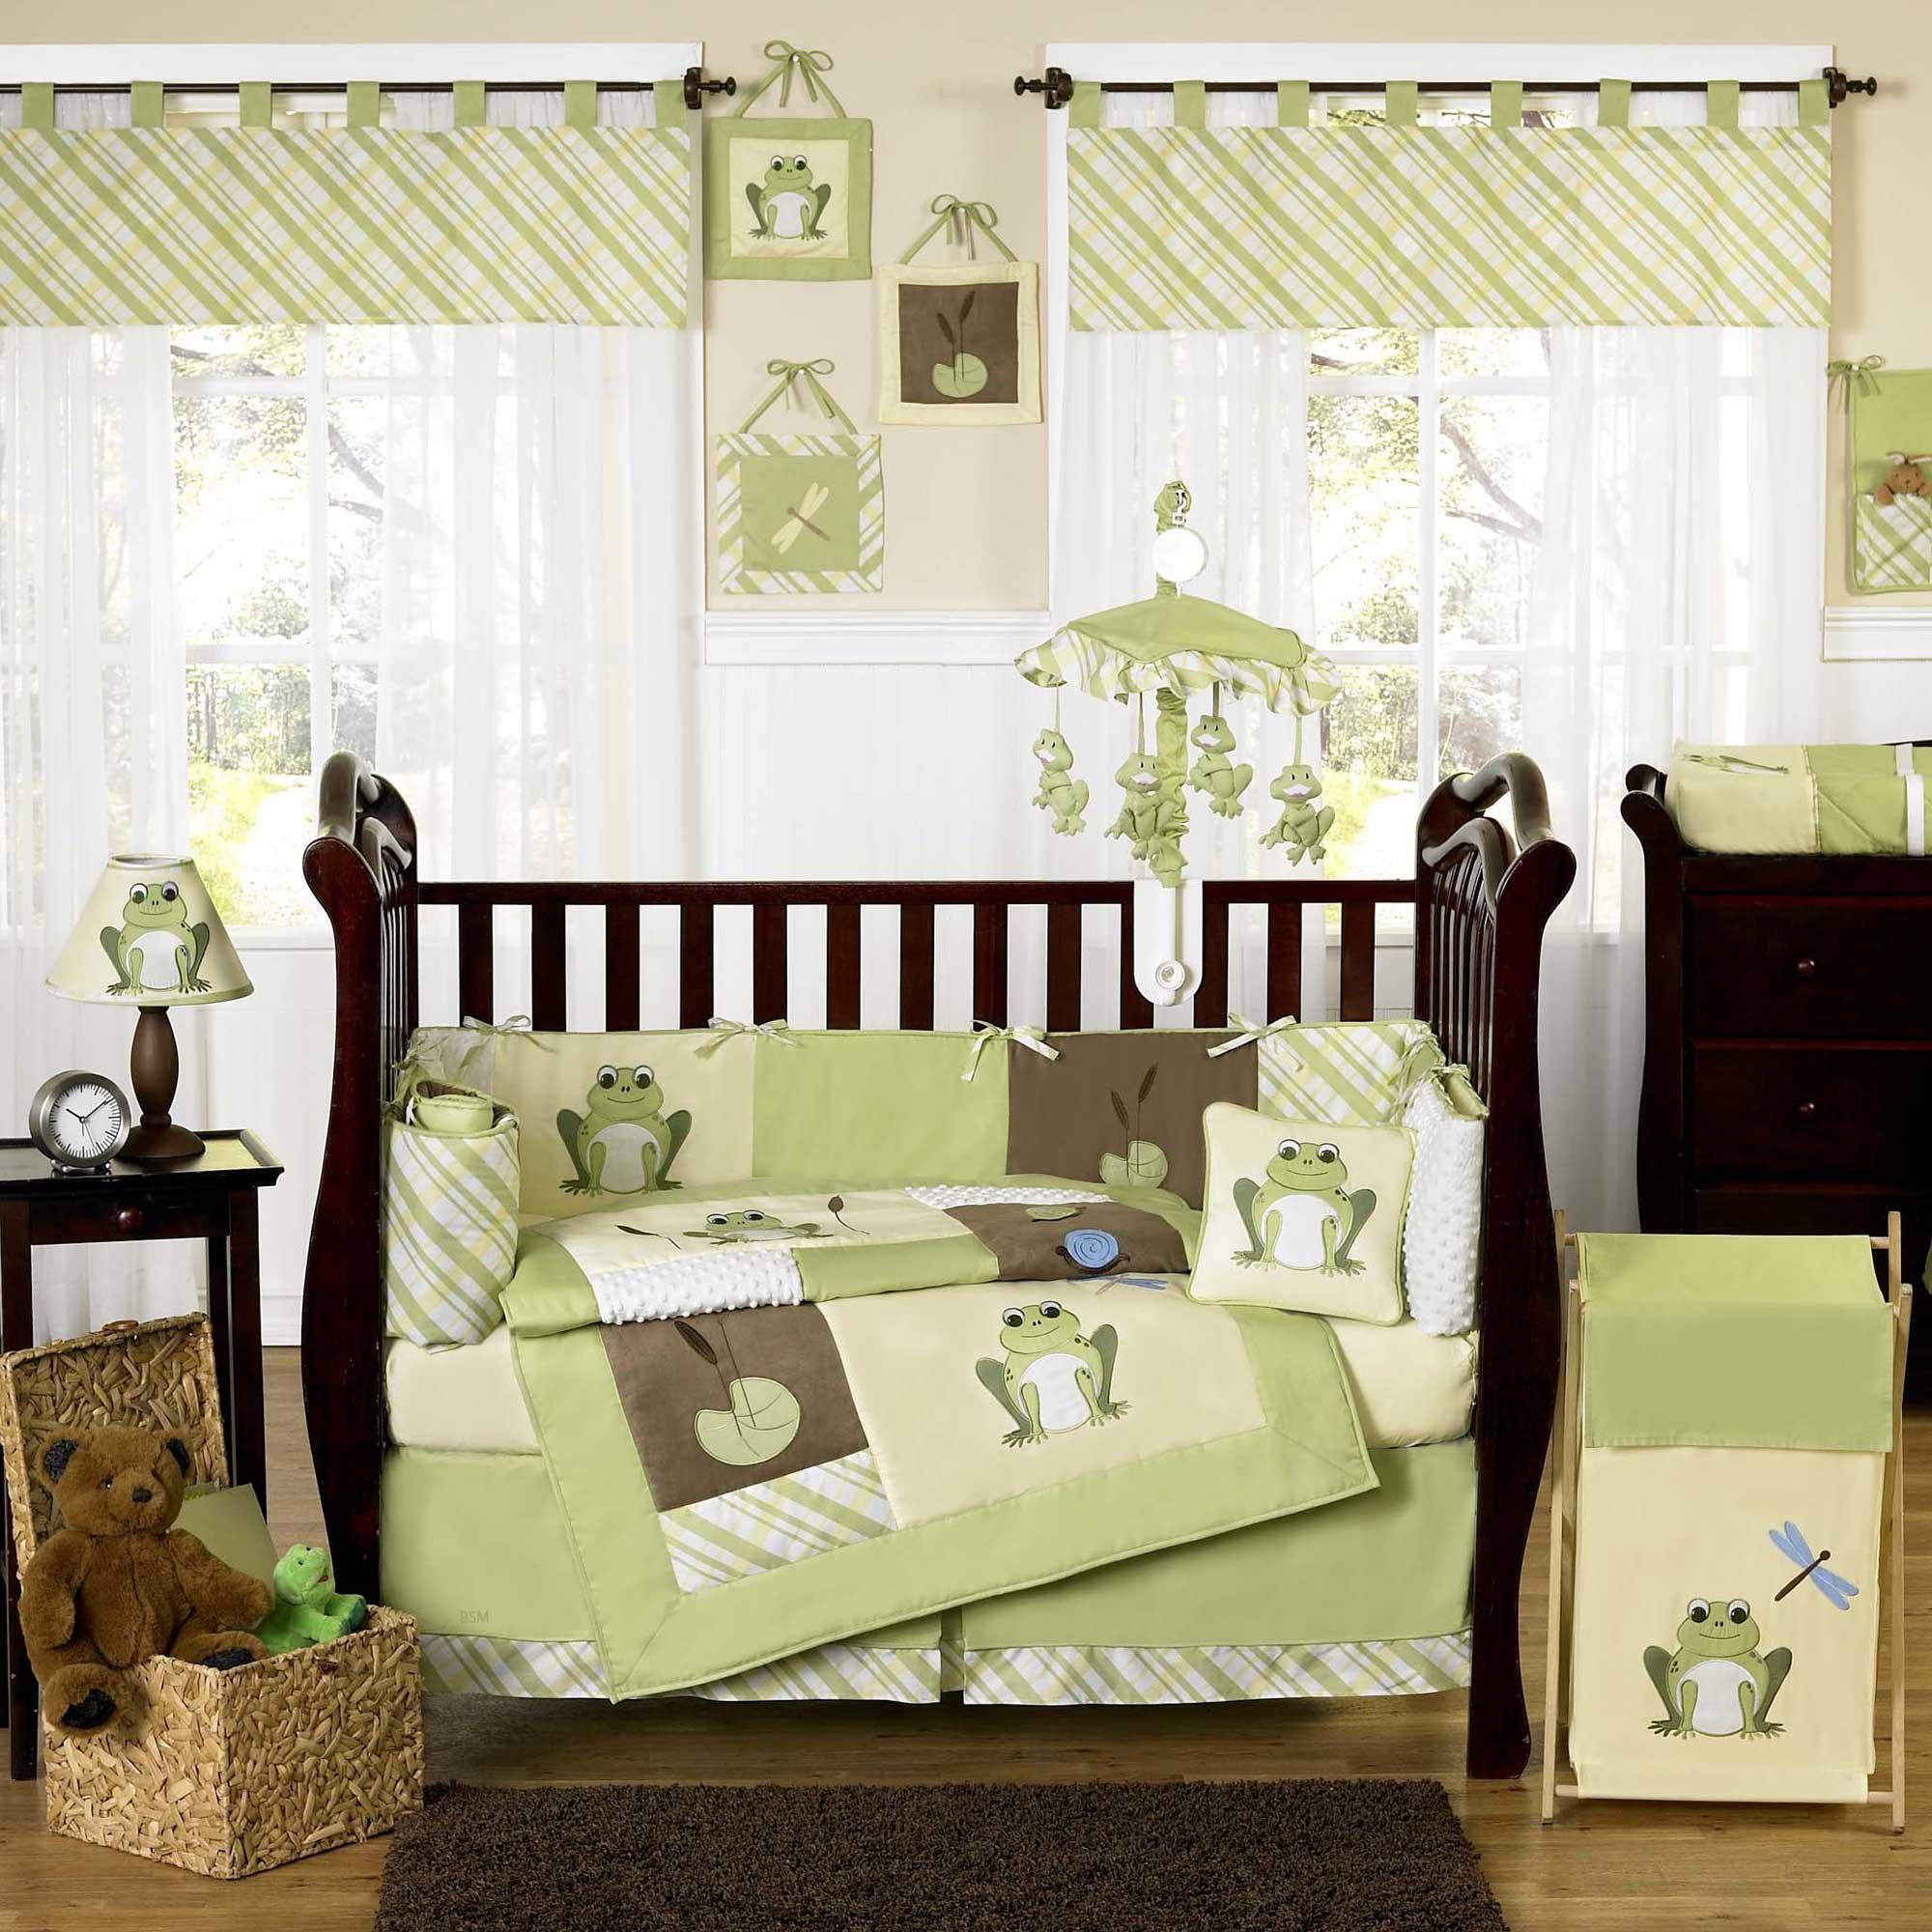 Newborn Baby Boy Room Decor  Themes For Baby Rooms Ideas – HomesFeed